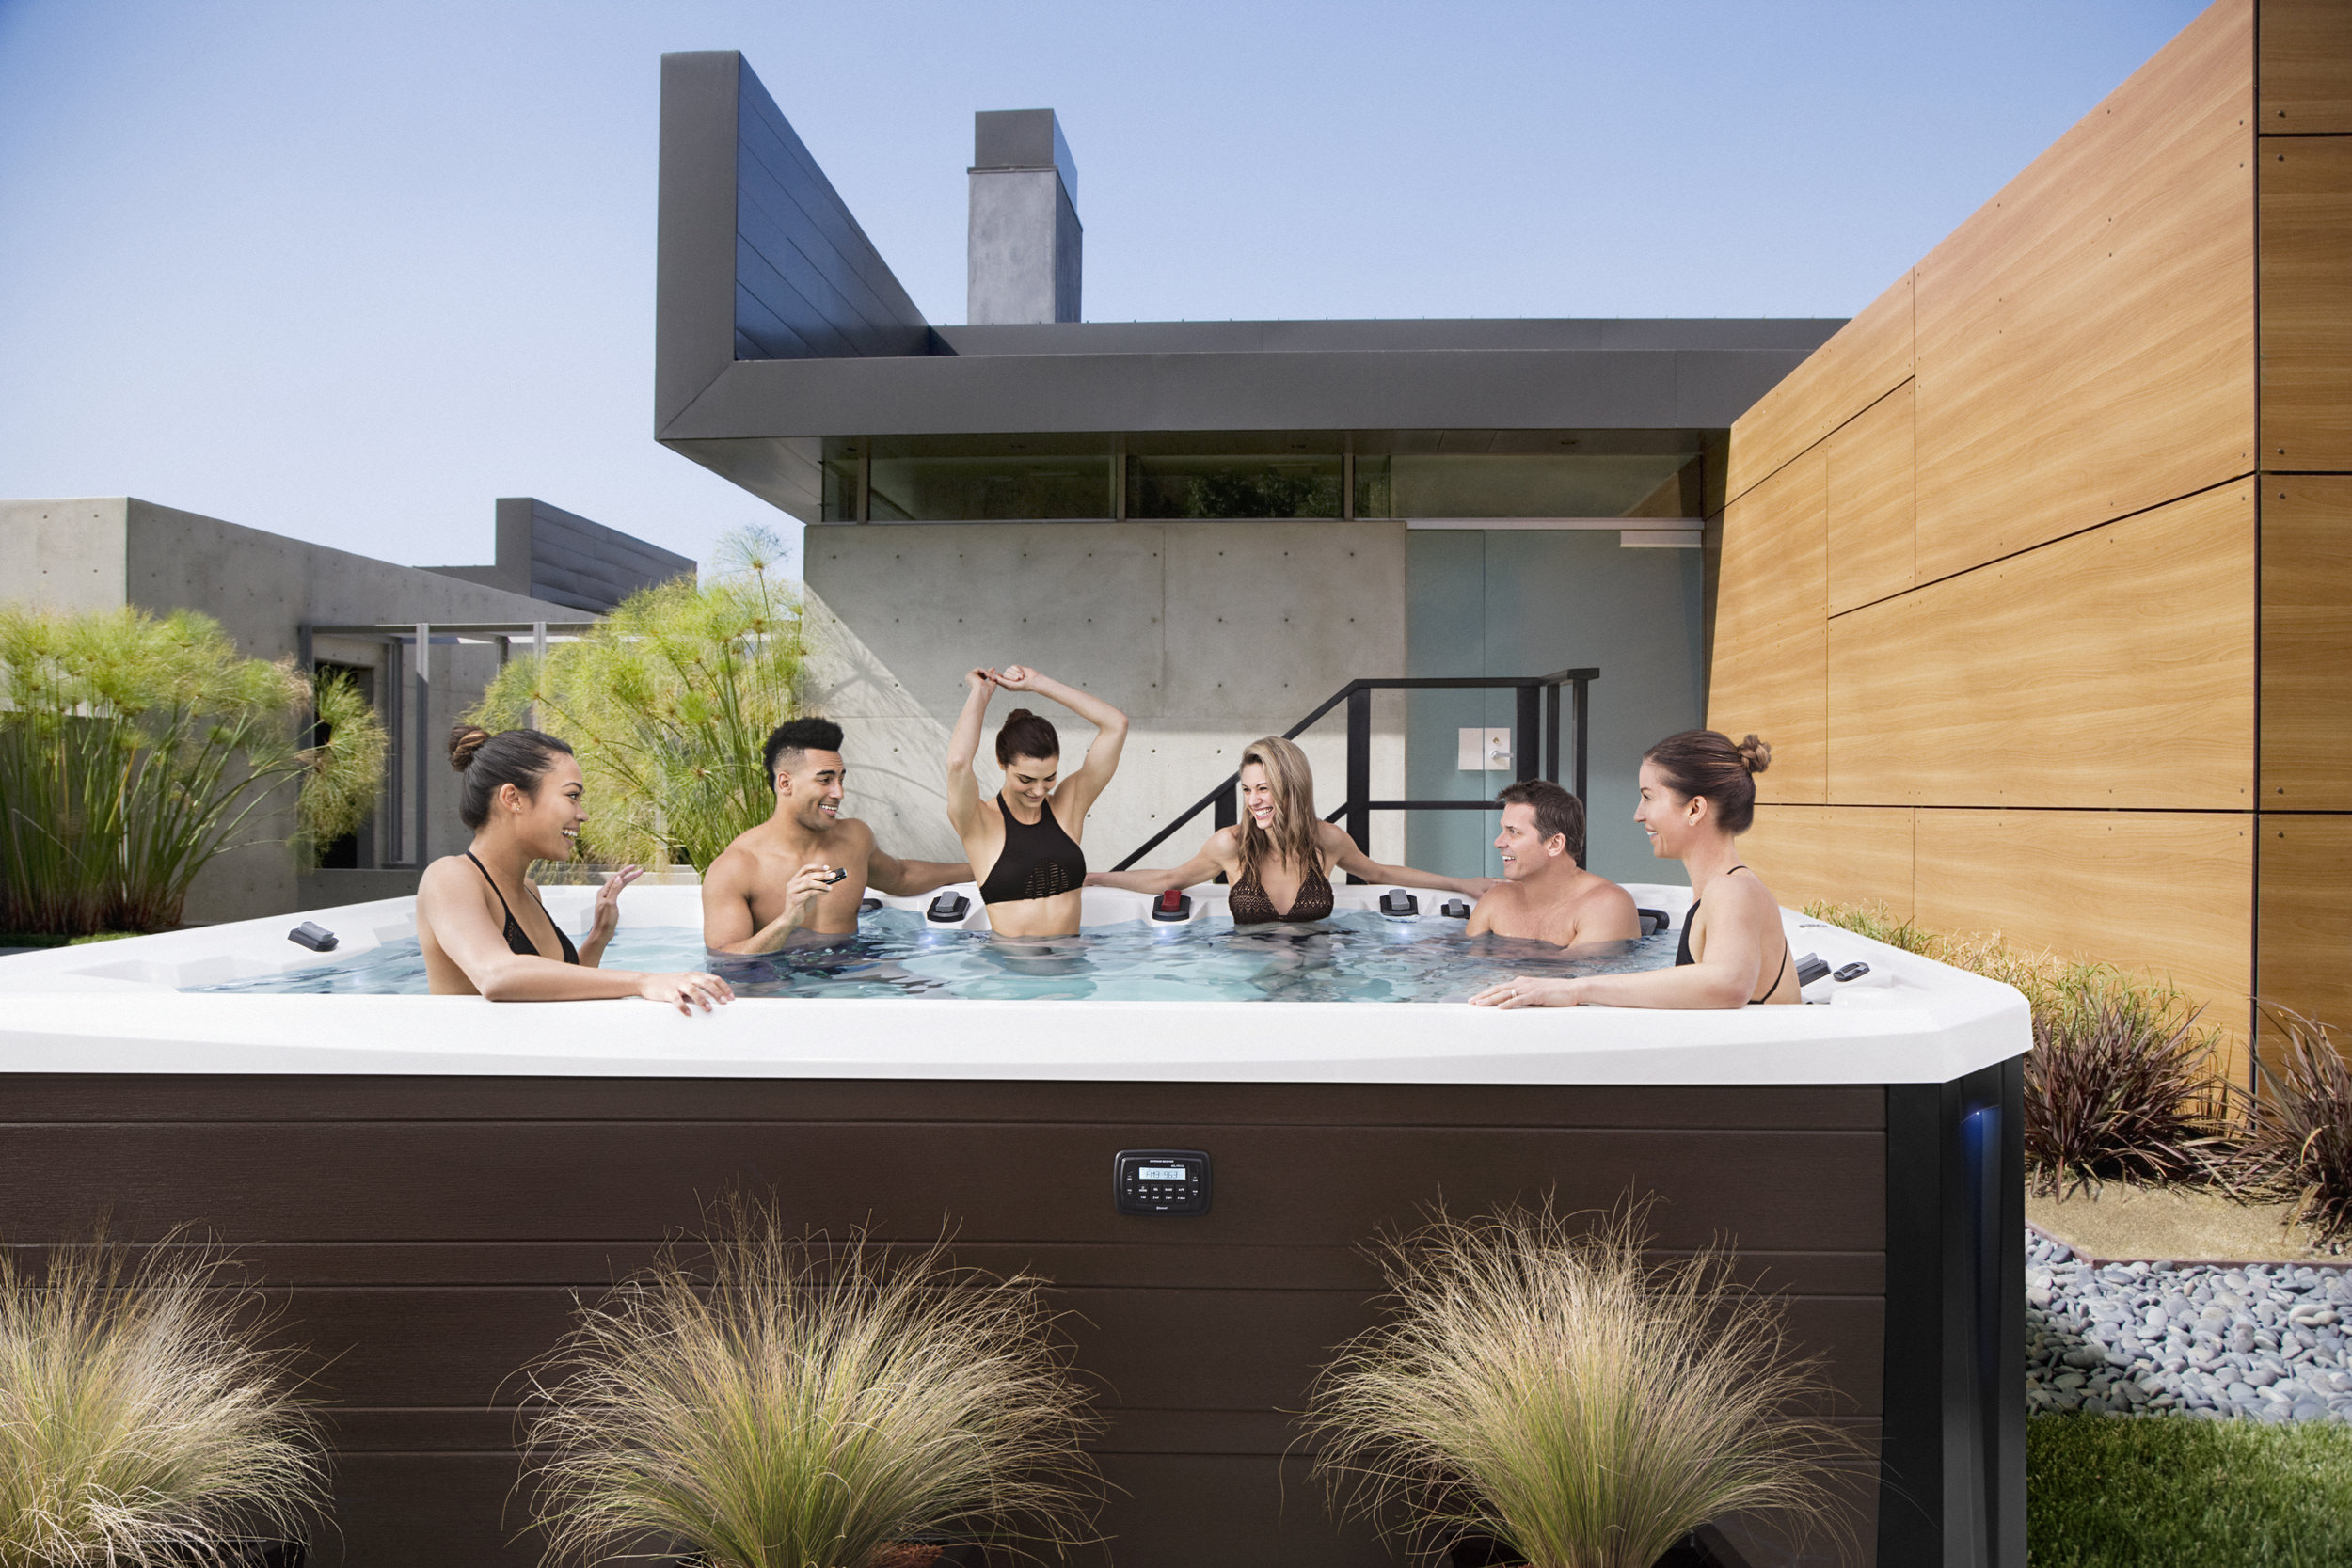 Columbia Pool and Spa Entertaining Hot Tub_V150.jpg